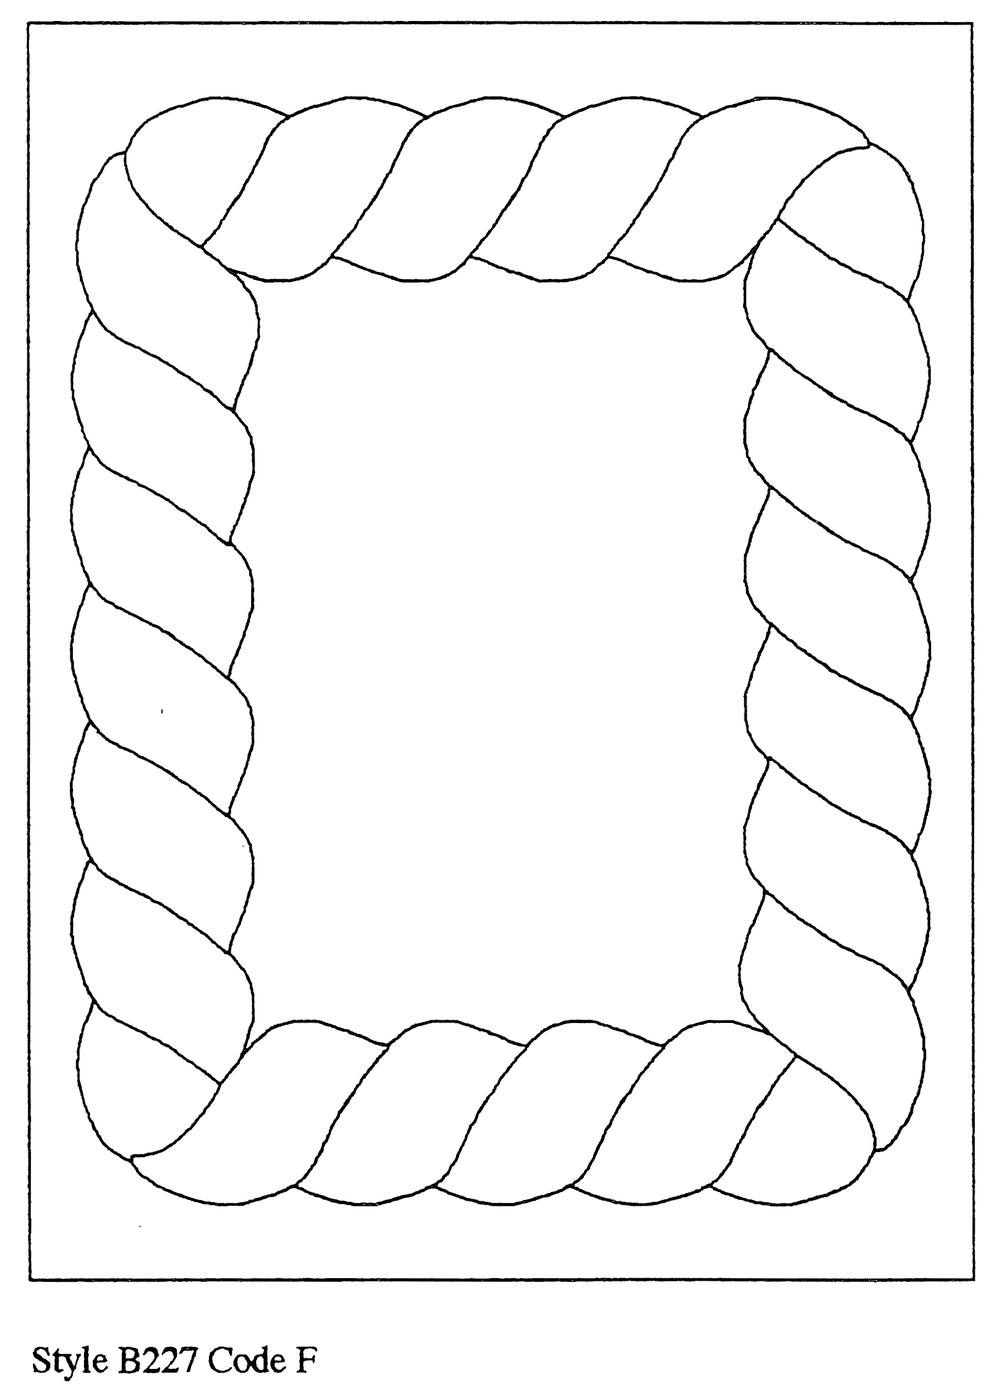 P3-B227.jpg